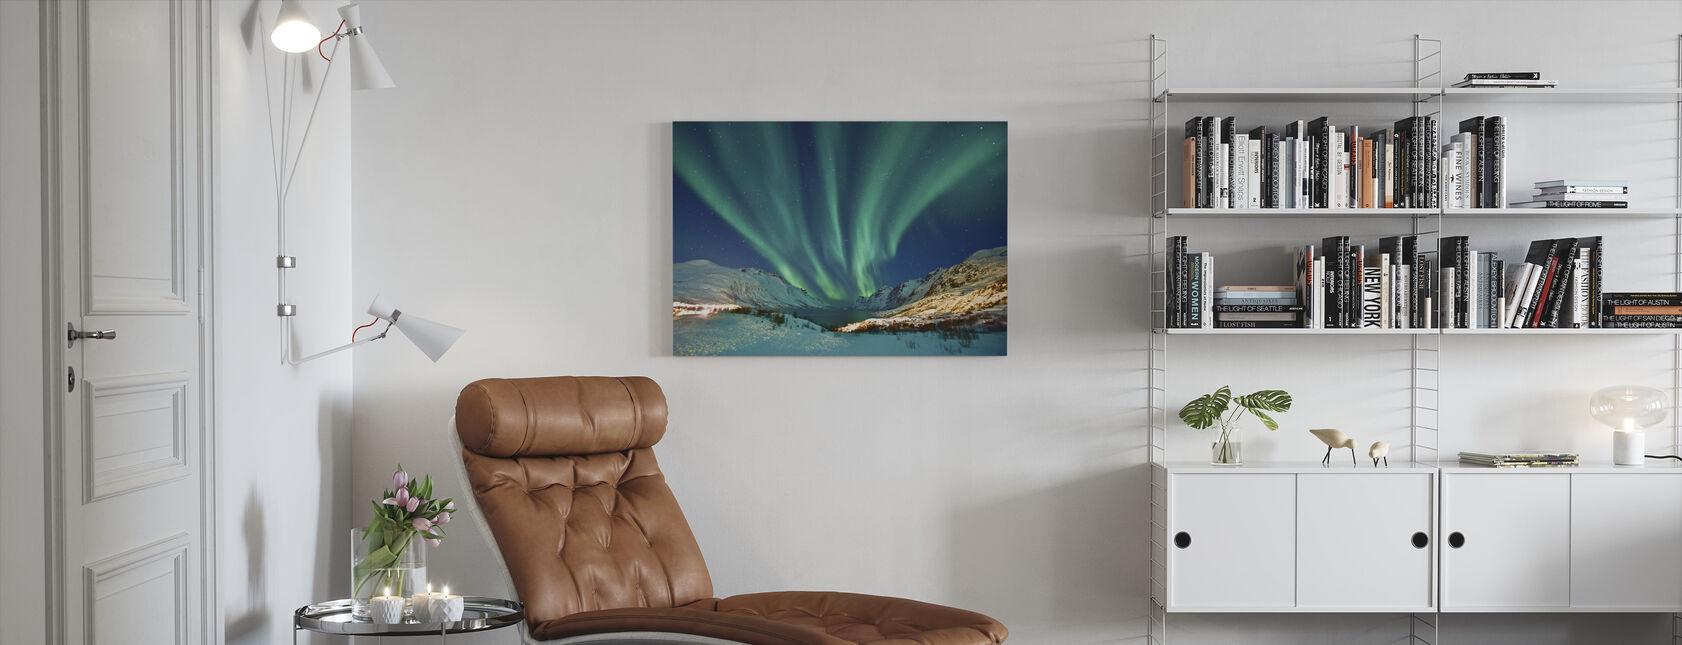 Aurora Borealis - Canvastaulu - Olohuone